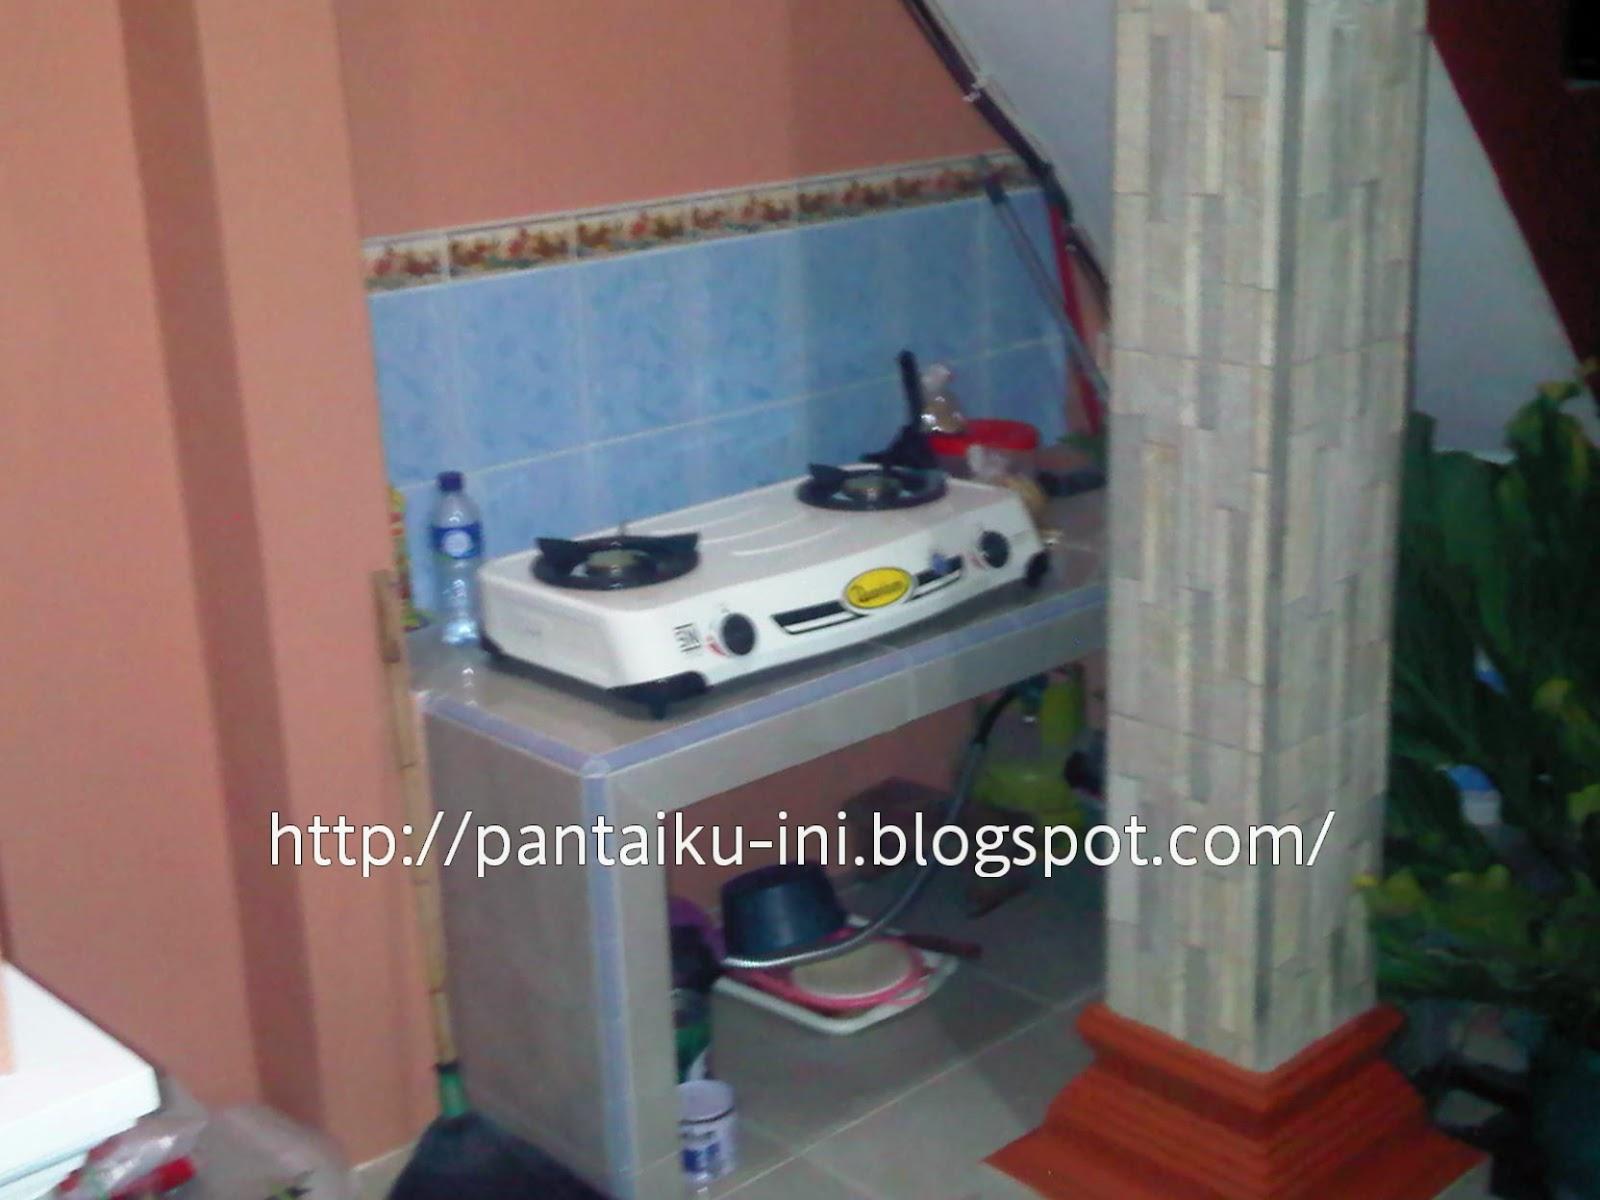 Dapur Pondok Alin - http://pantaiku-ini.blogspot.com/2014/10/detaiil-pondok-alin.html